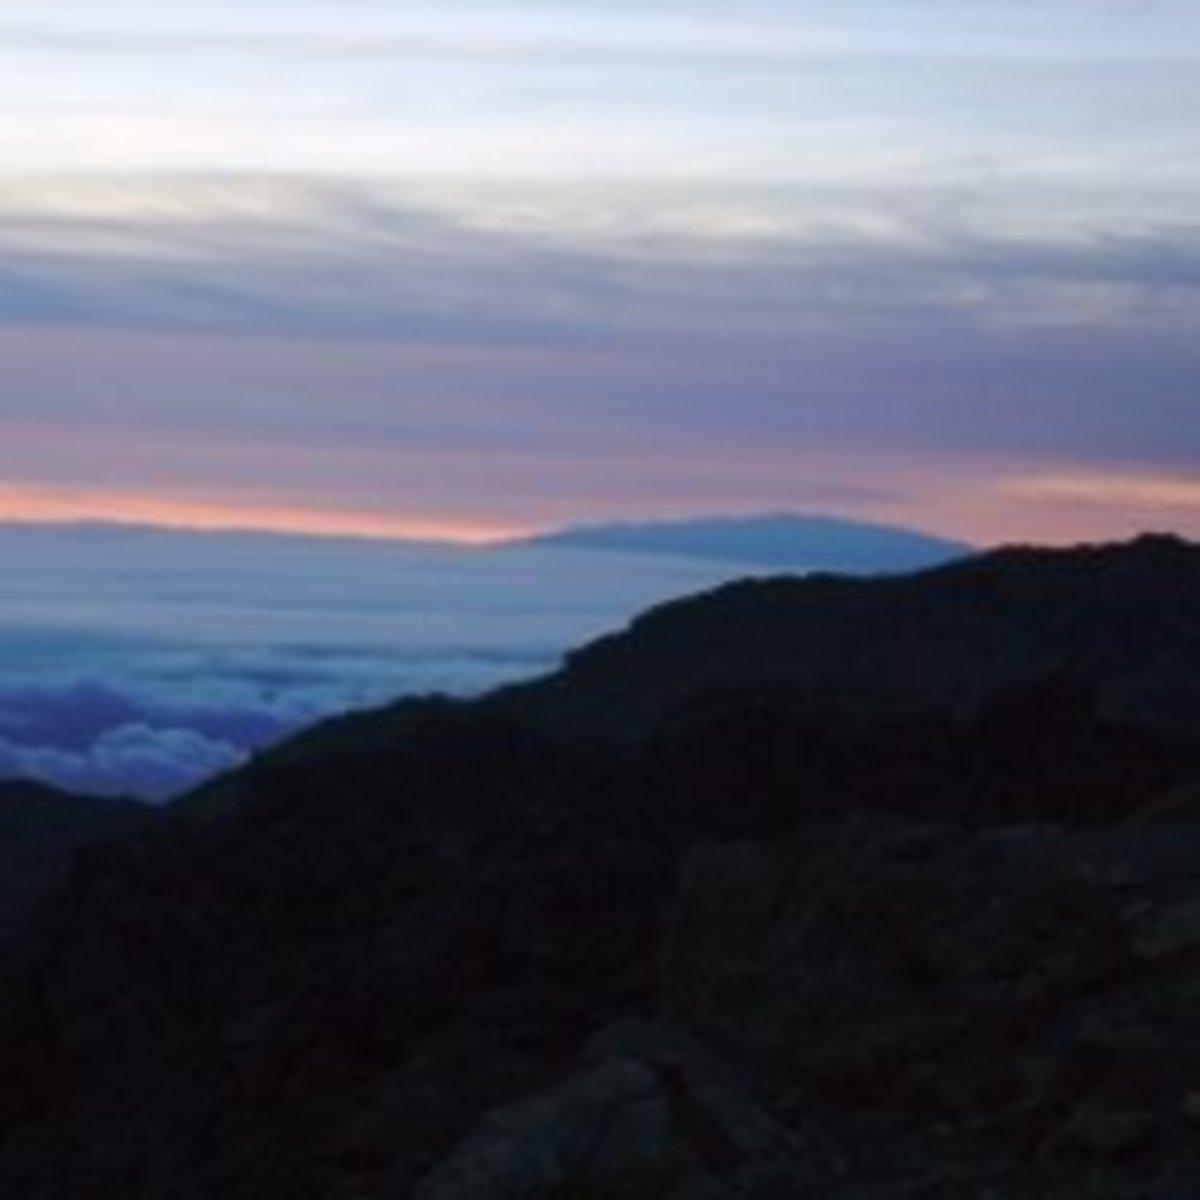 View from the Haleakala Volcano - Maui, Hawaii